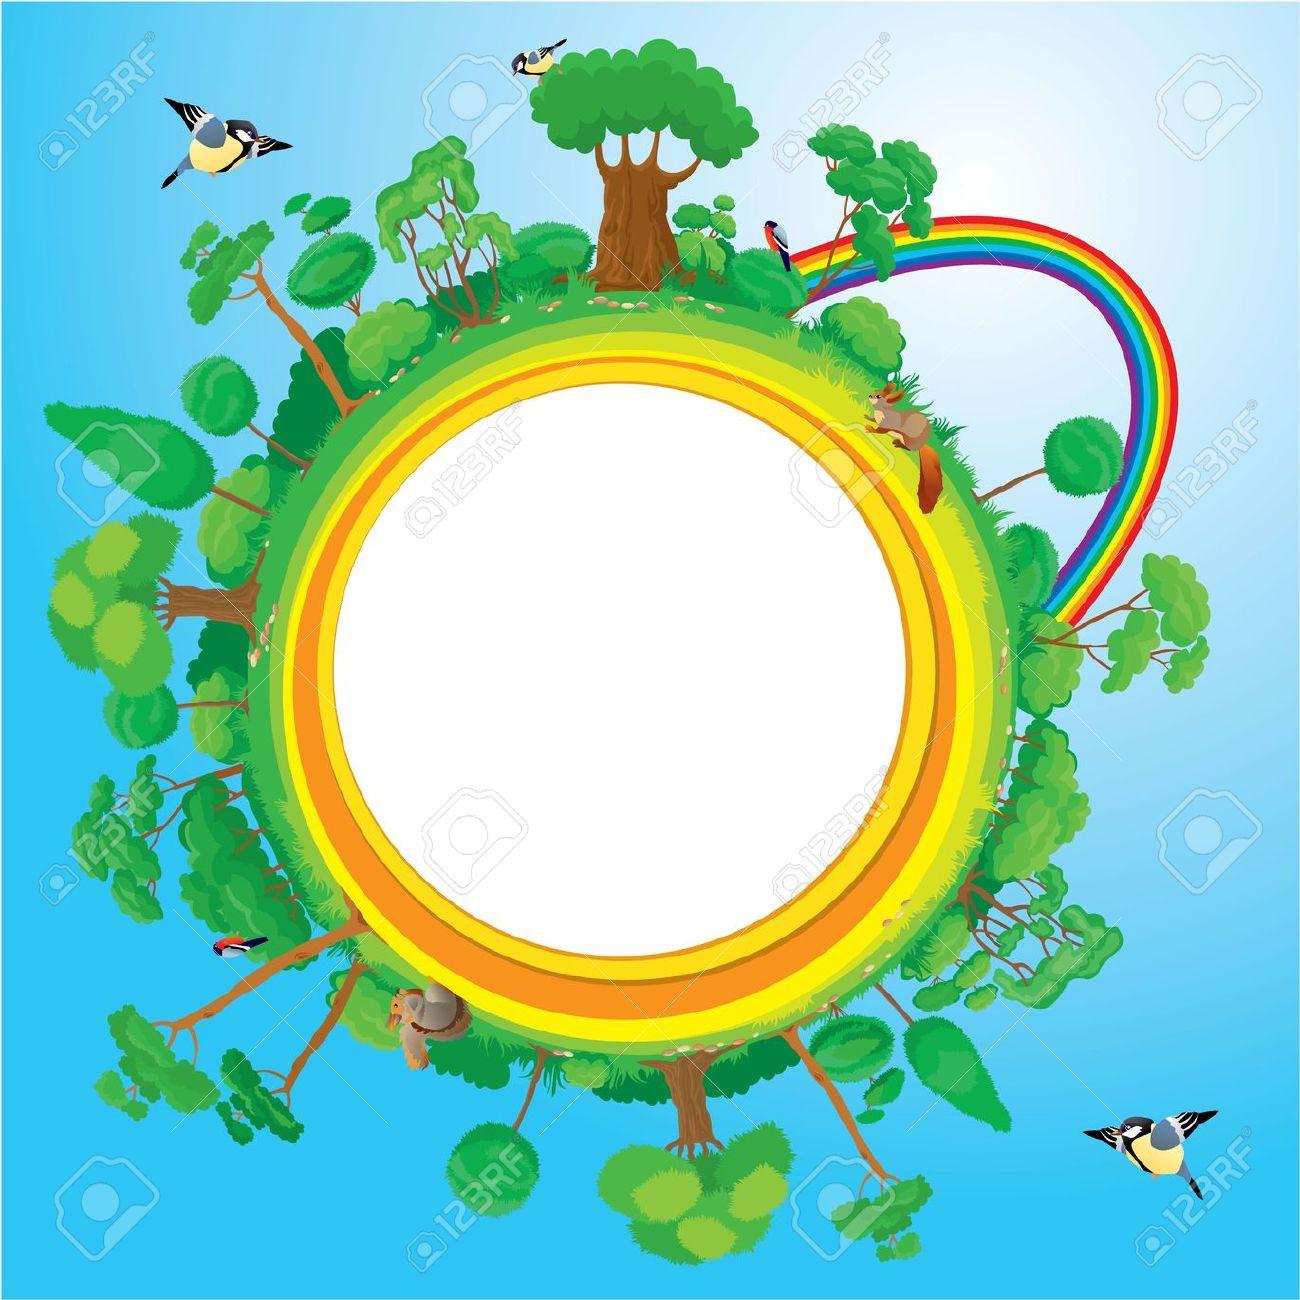 Globe With Green Trees, Birds, Animals, Rainbow.